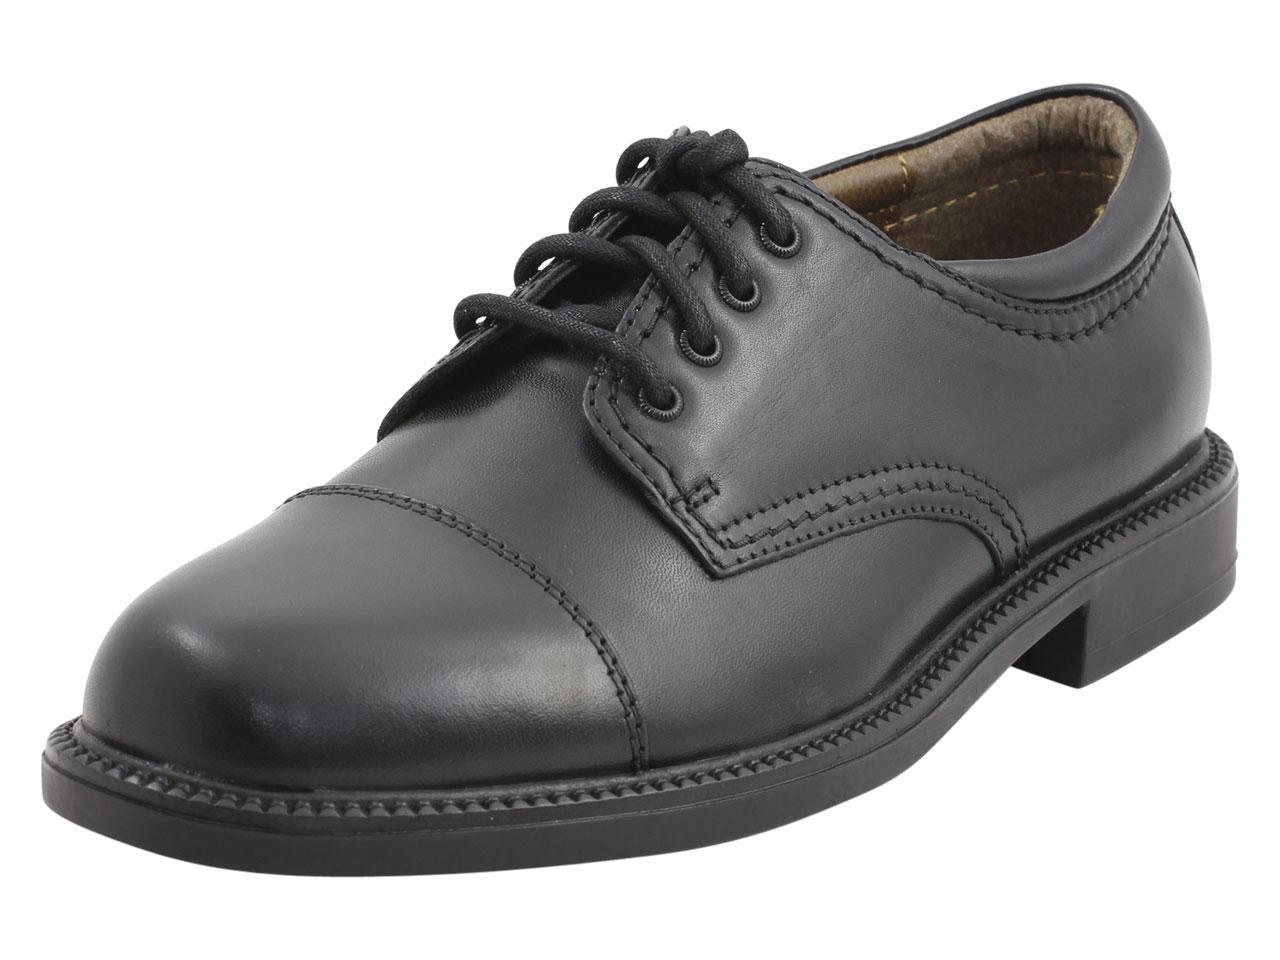 Image of Dockers Men's Gordon Cap Toe Oxfords Shoes - Black - 10.5 E(W) US